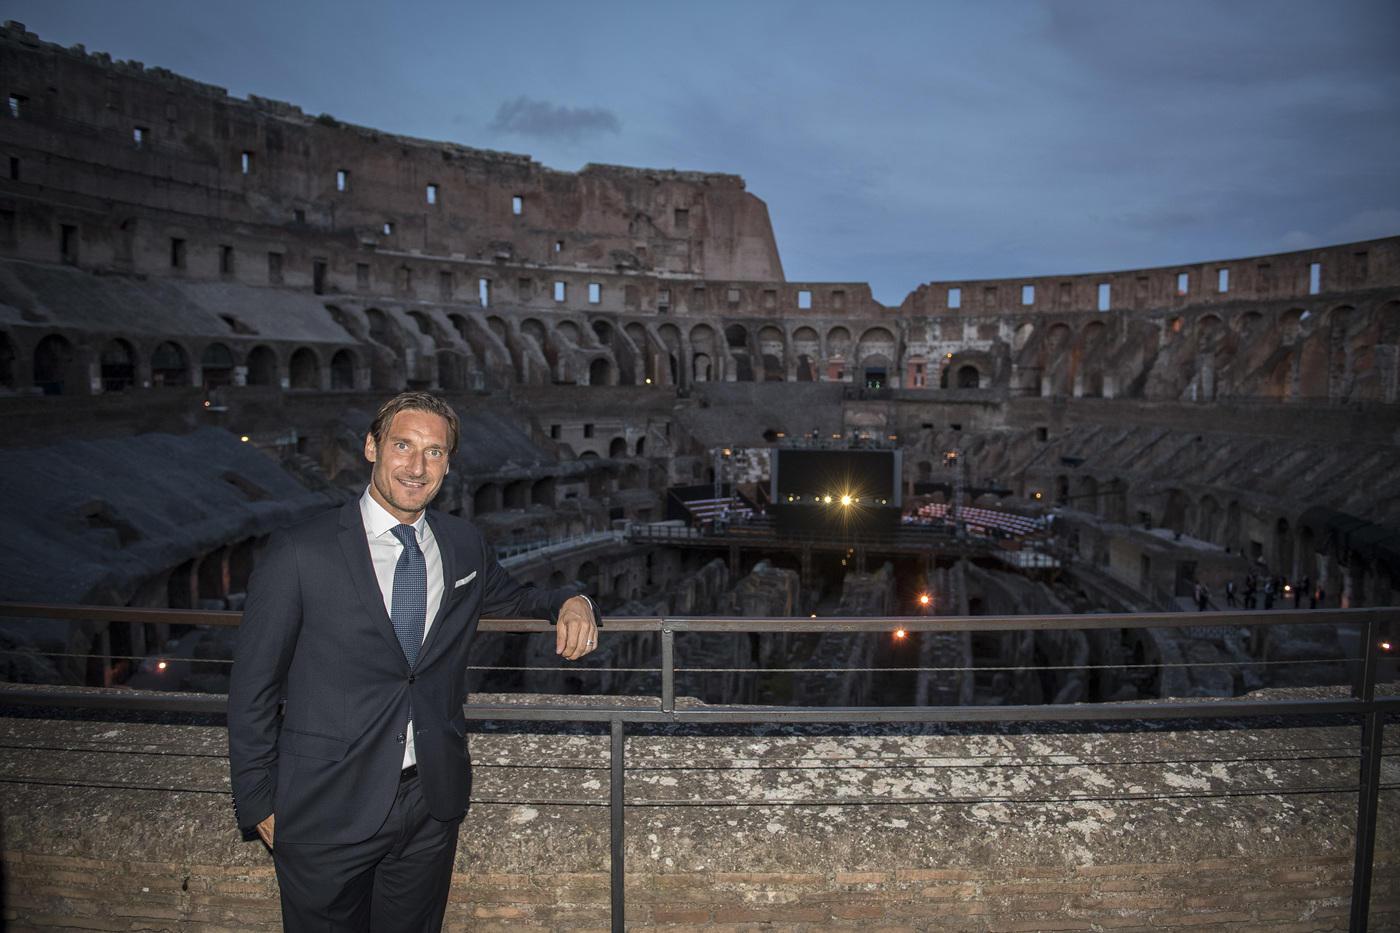 Totti da Russell Crowe: i Gladiatori di Roma